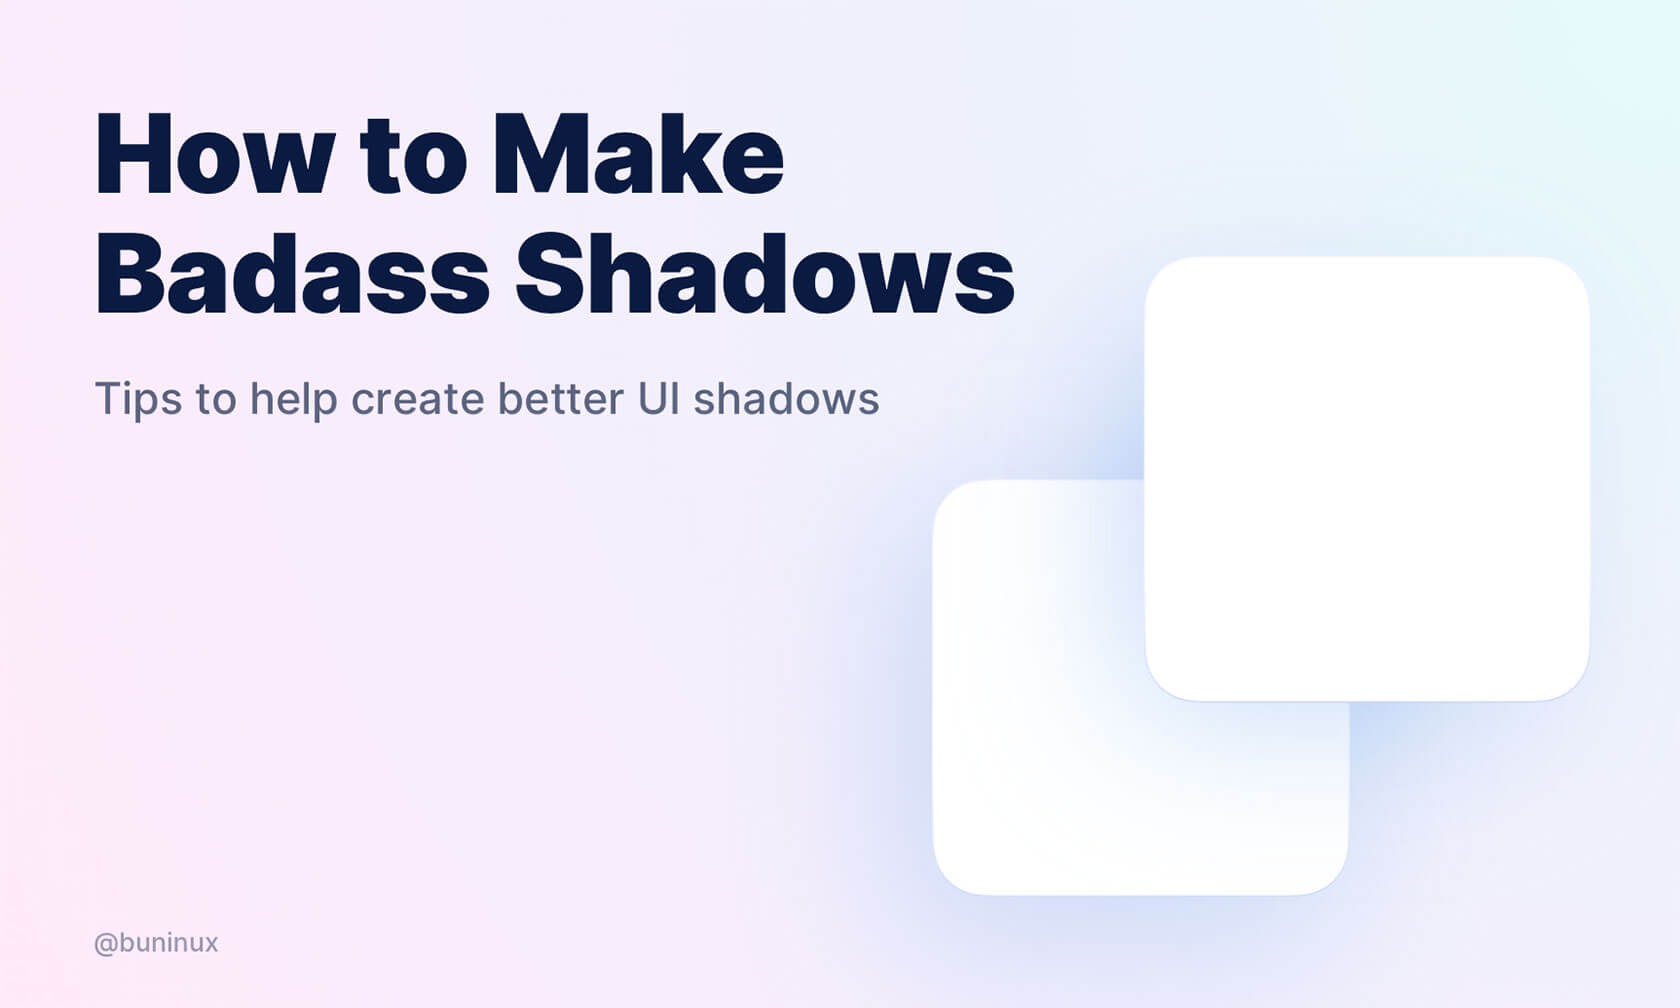 how-to-make-badass-shadow-1